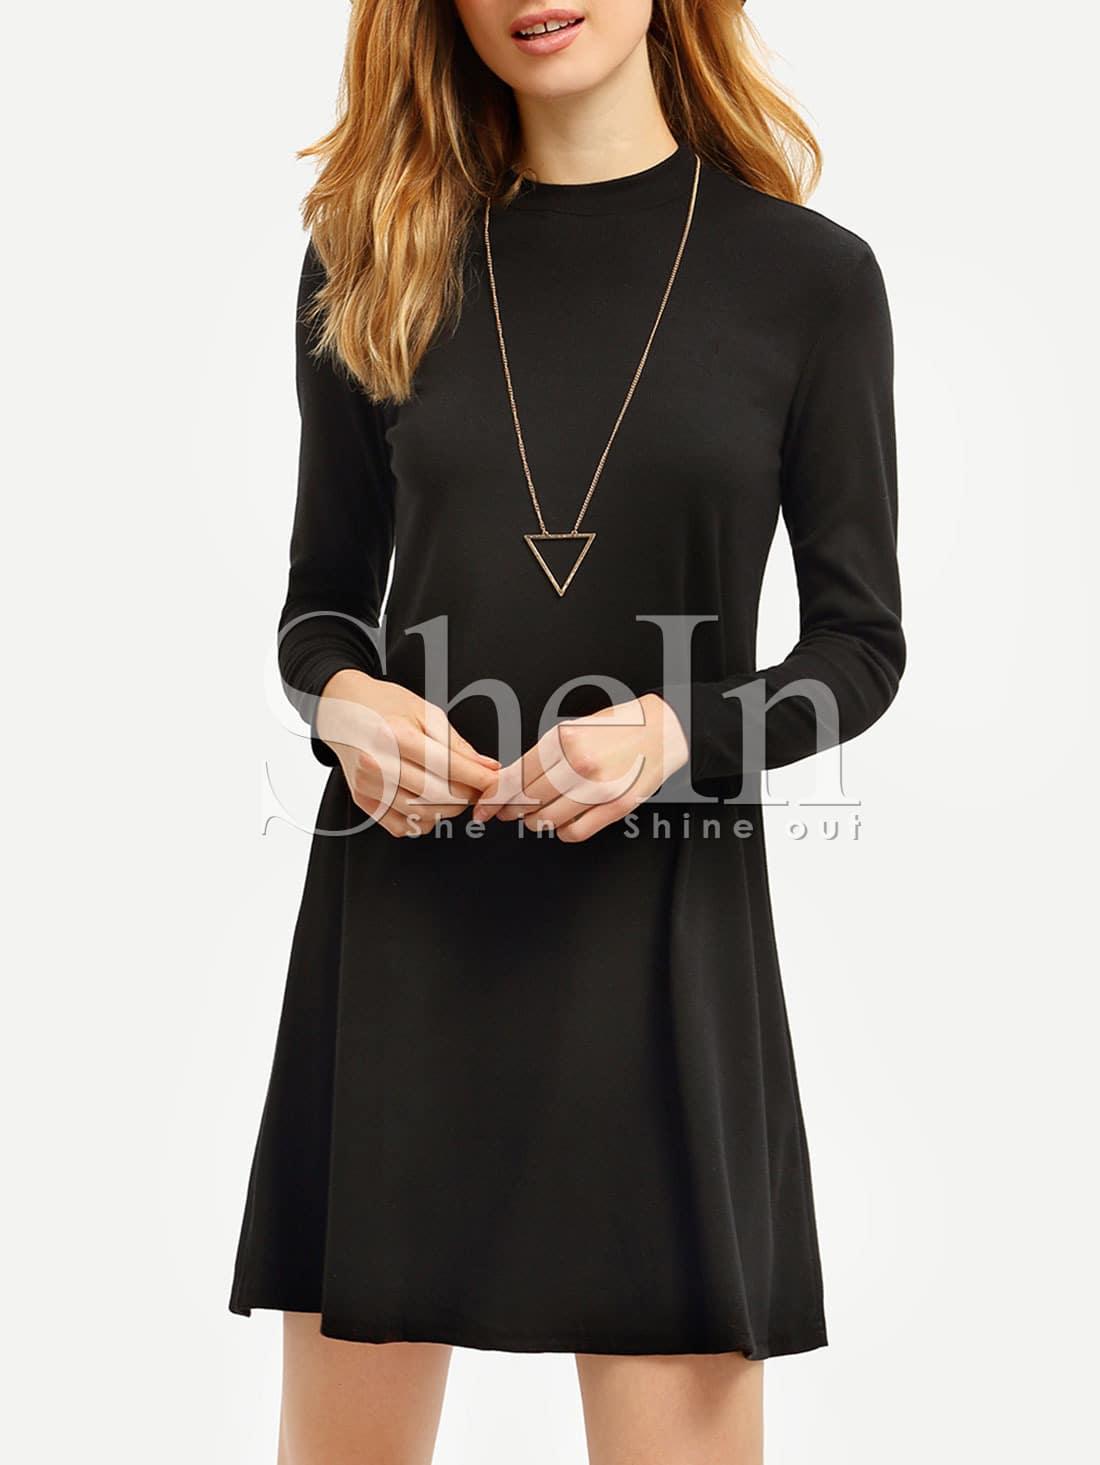 schwarze lange hülse beiläufiges t-shirt-kleid